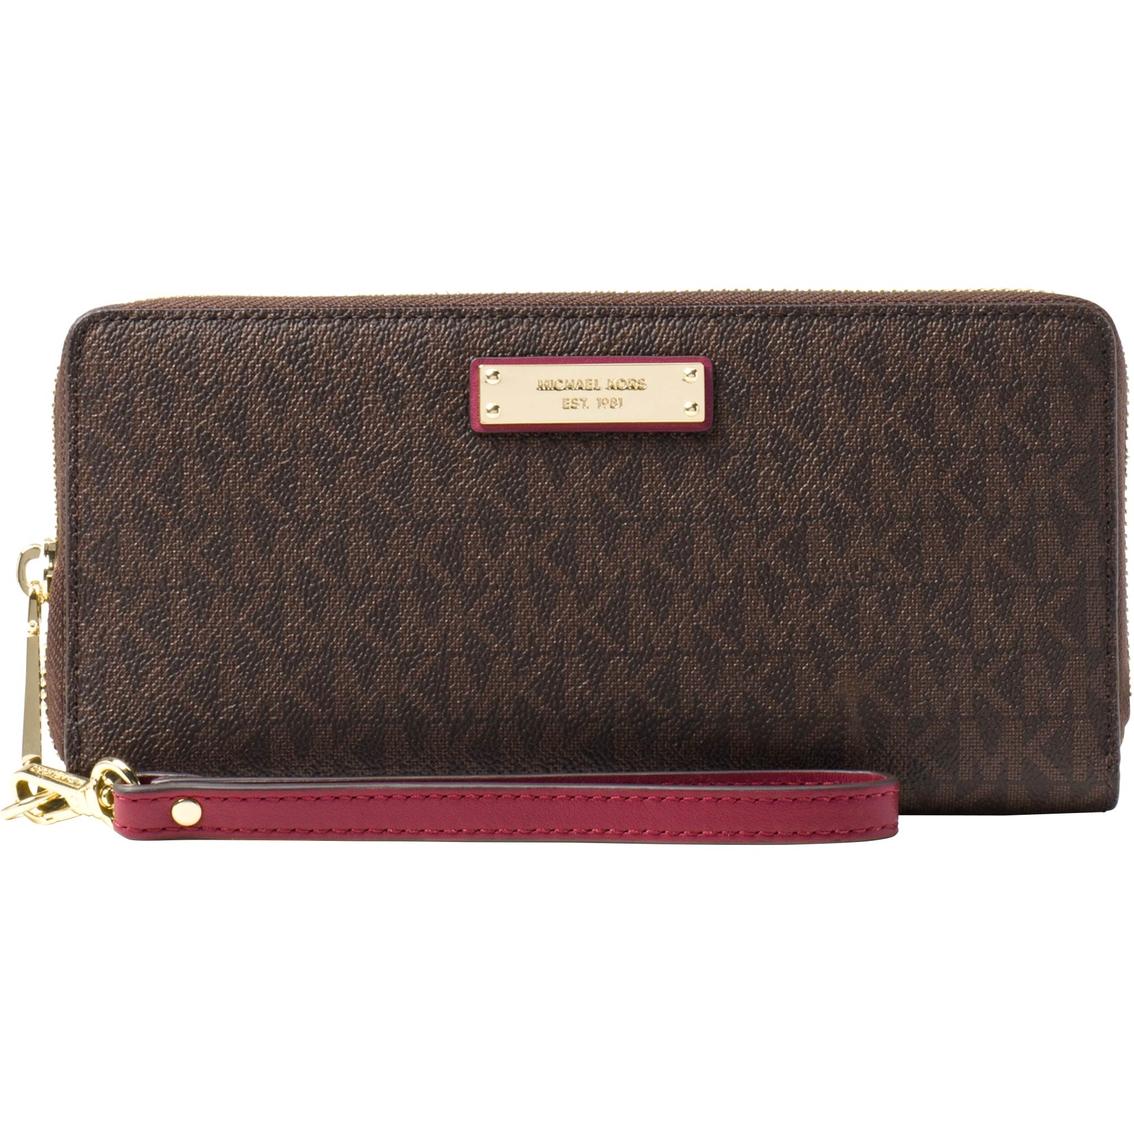 3e9945e580cf Michael Kors Jet Set Travel Continental Wristlet | Handbags | Shop ...